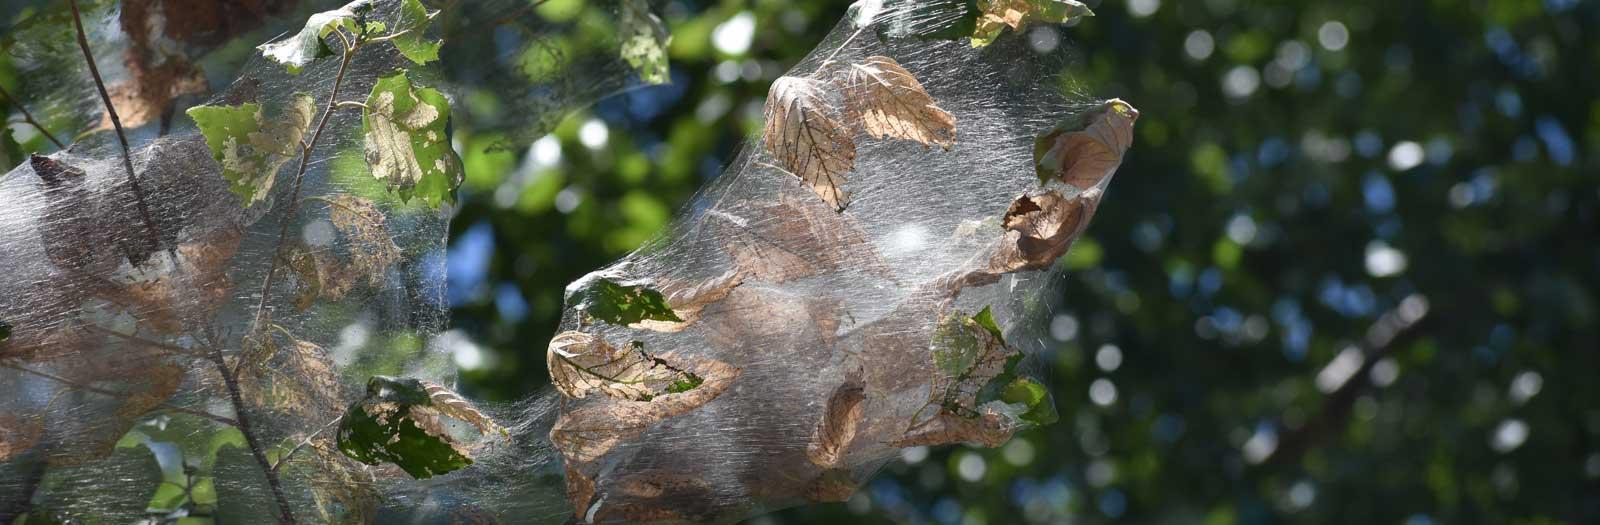 fall webworm nest